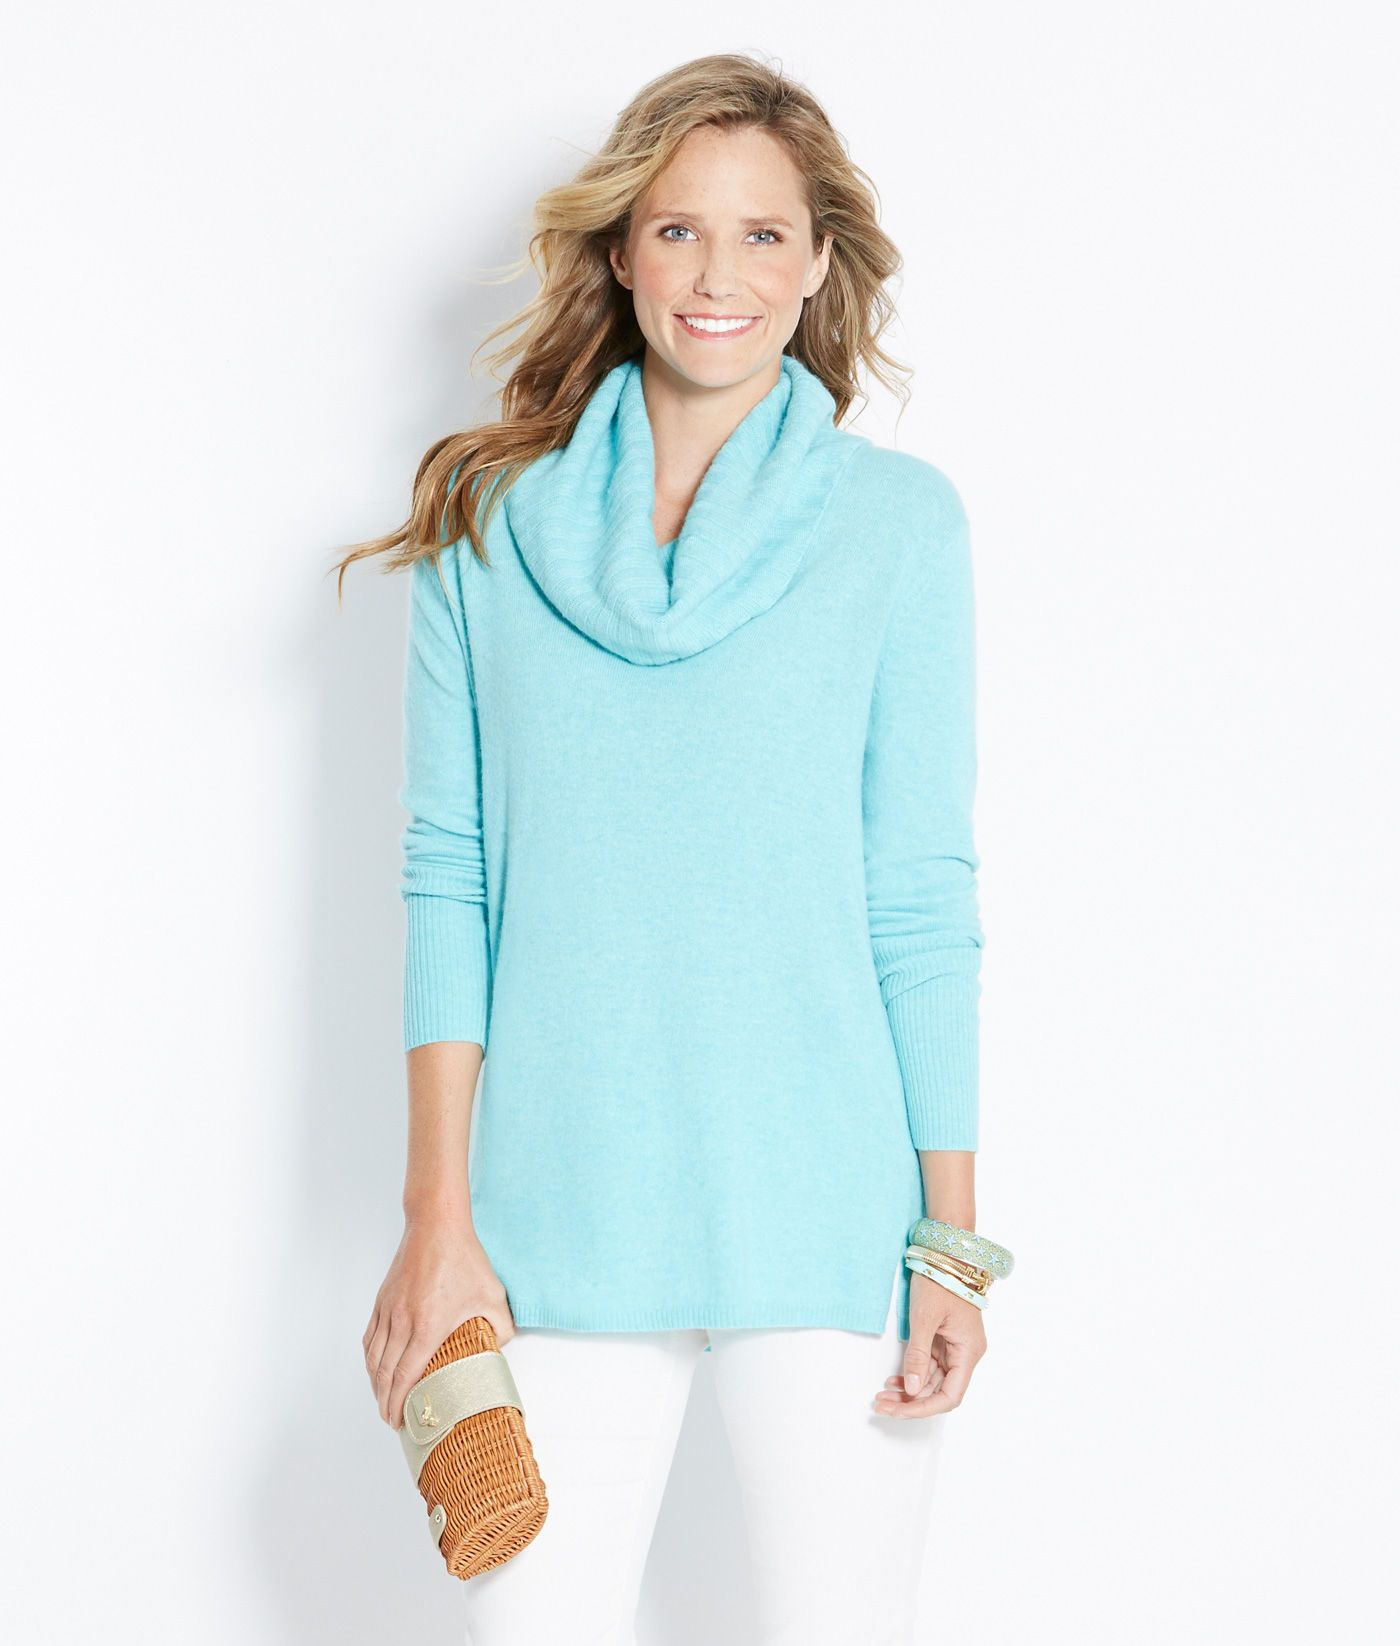 Shop sweaters sherwood cowlneck sweater for women vineyard vines